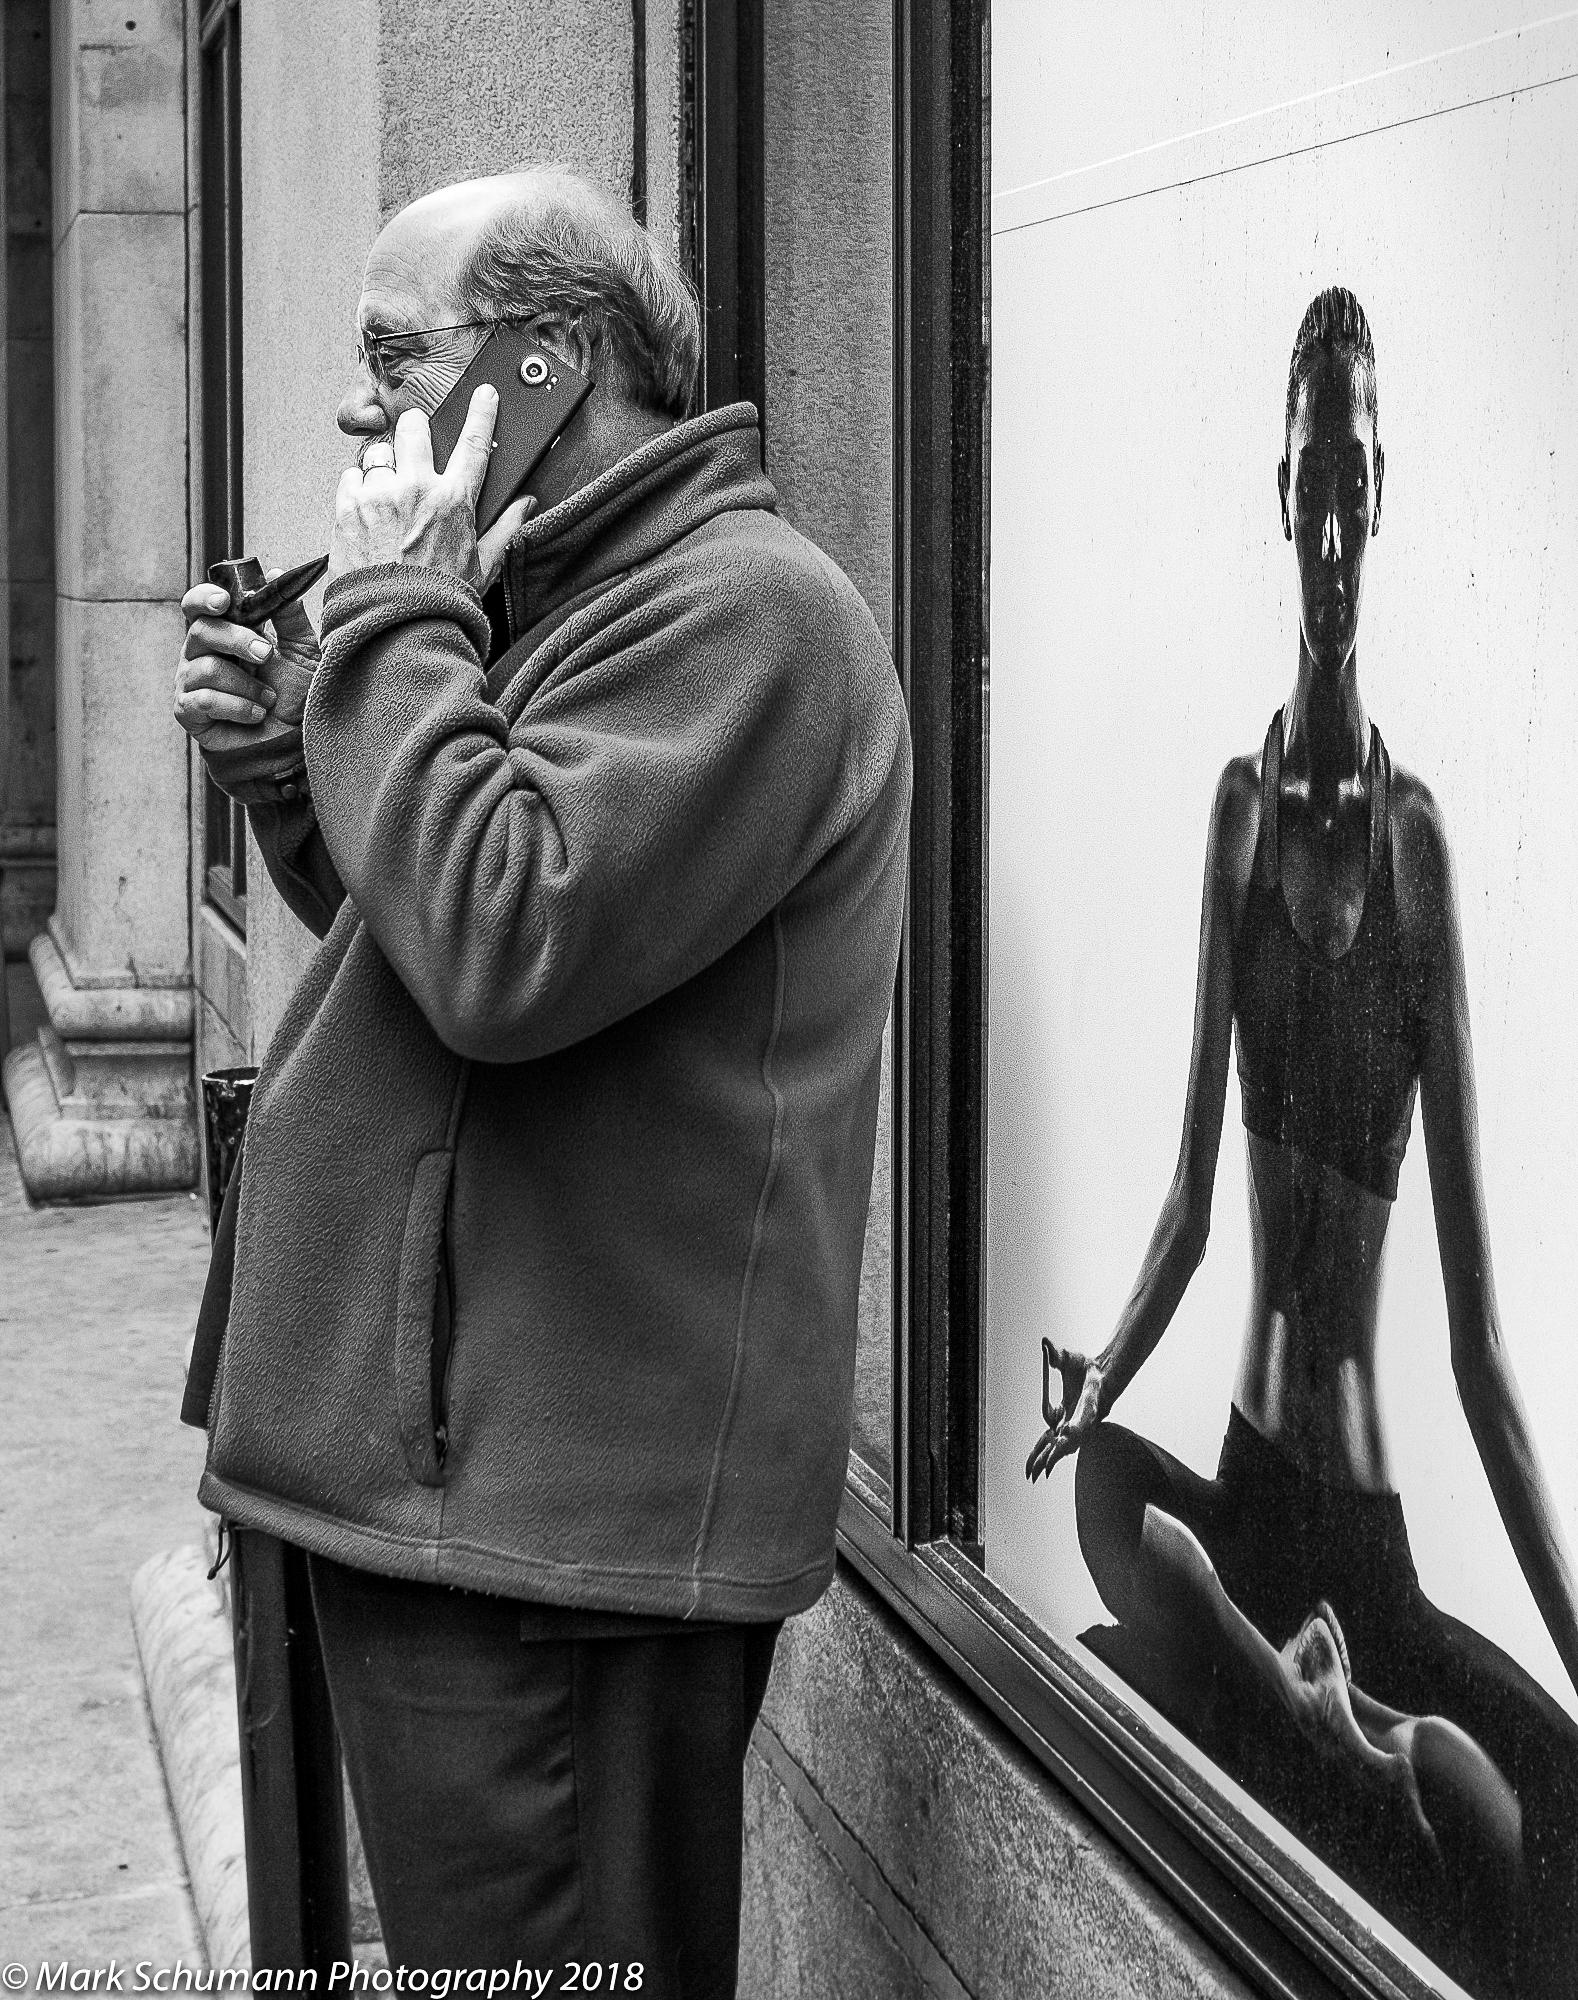 Street Photography_Chicago_Pipe Smoker_113018.jpg